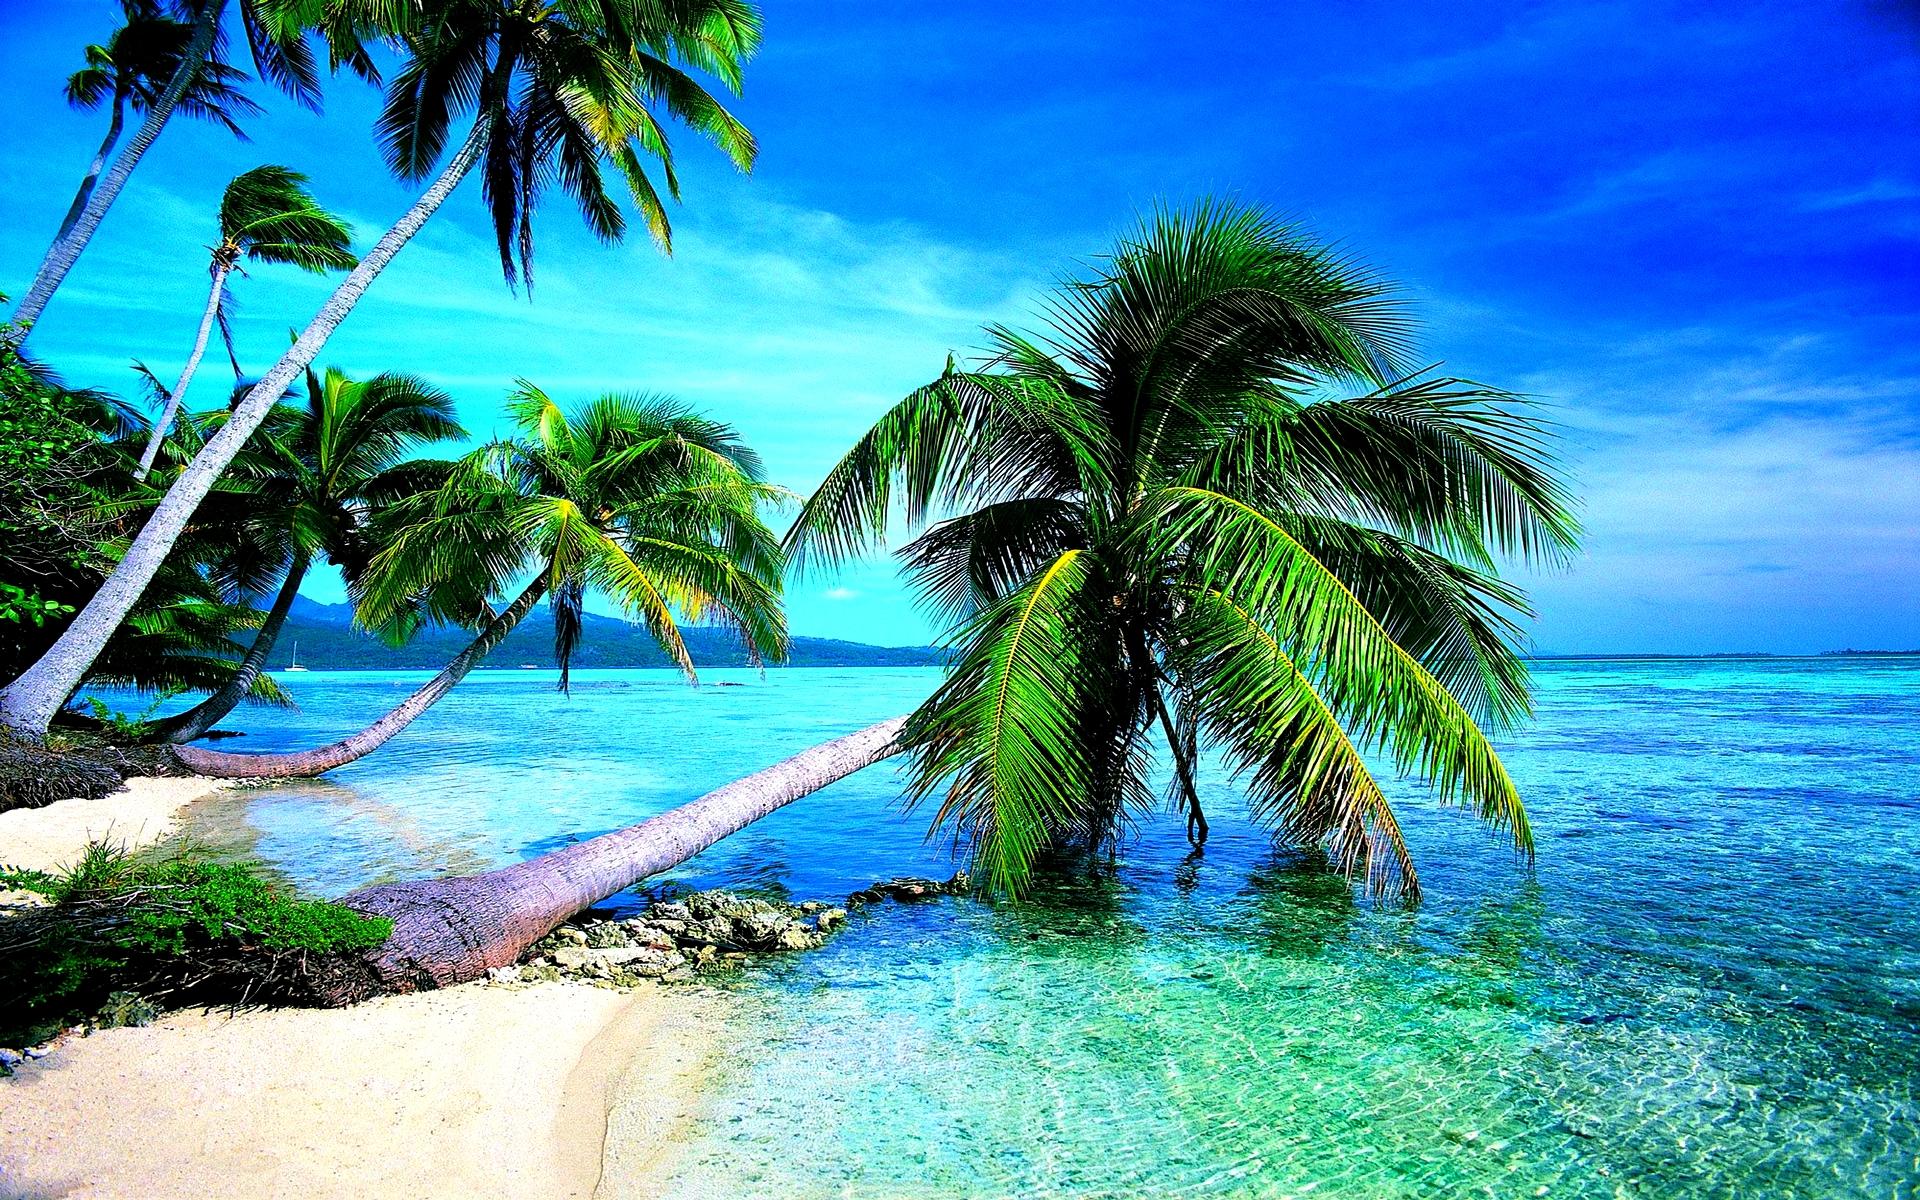 Tropical Beach HD Wallpaper Tropical Beach Images Cool Wallpapers 1920x1200